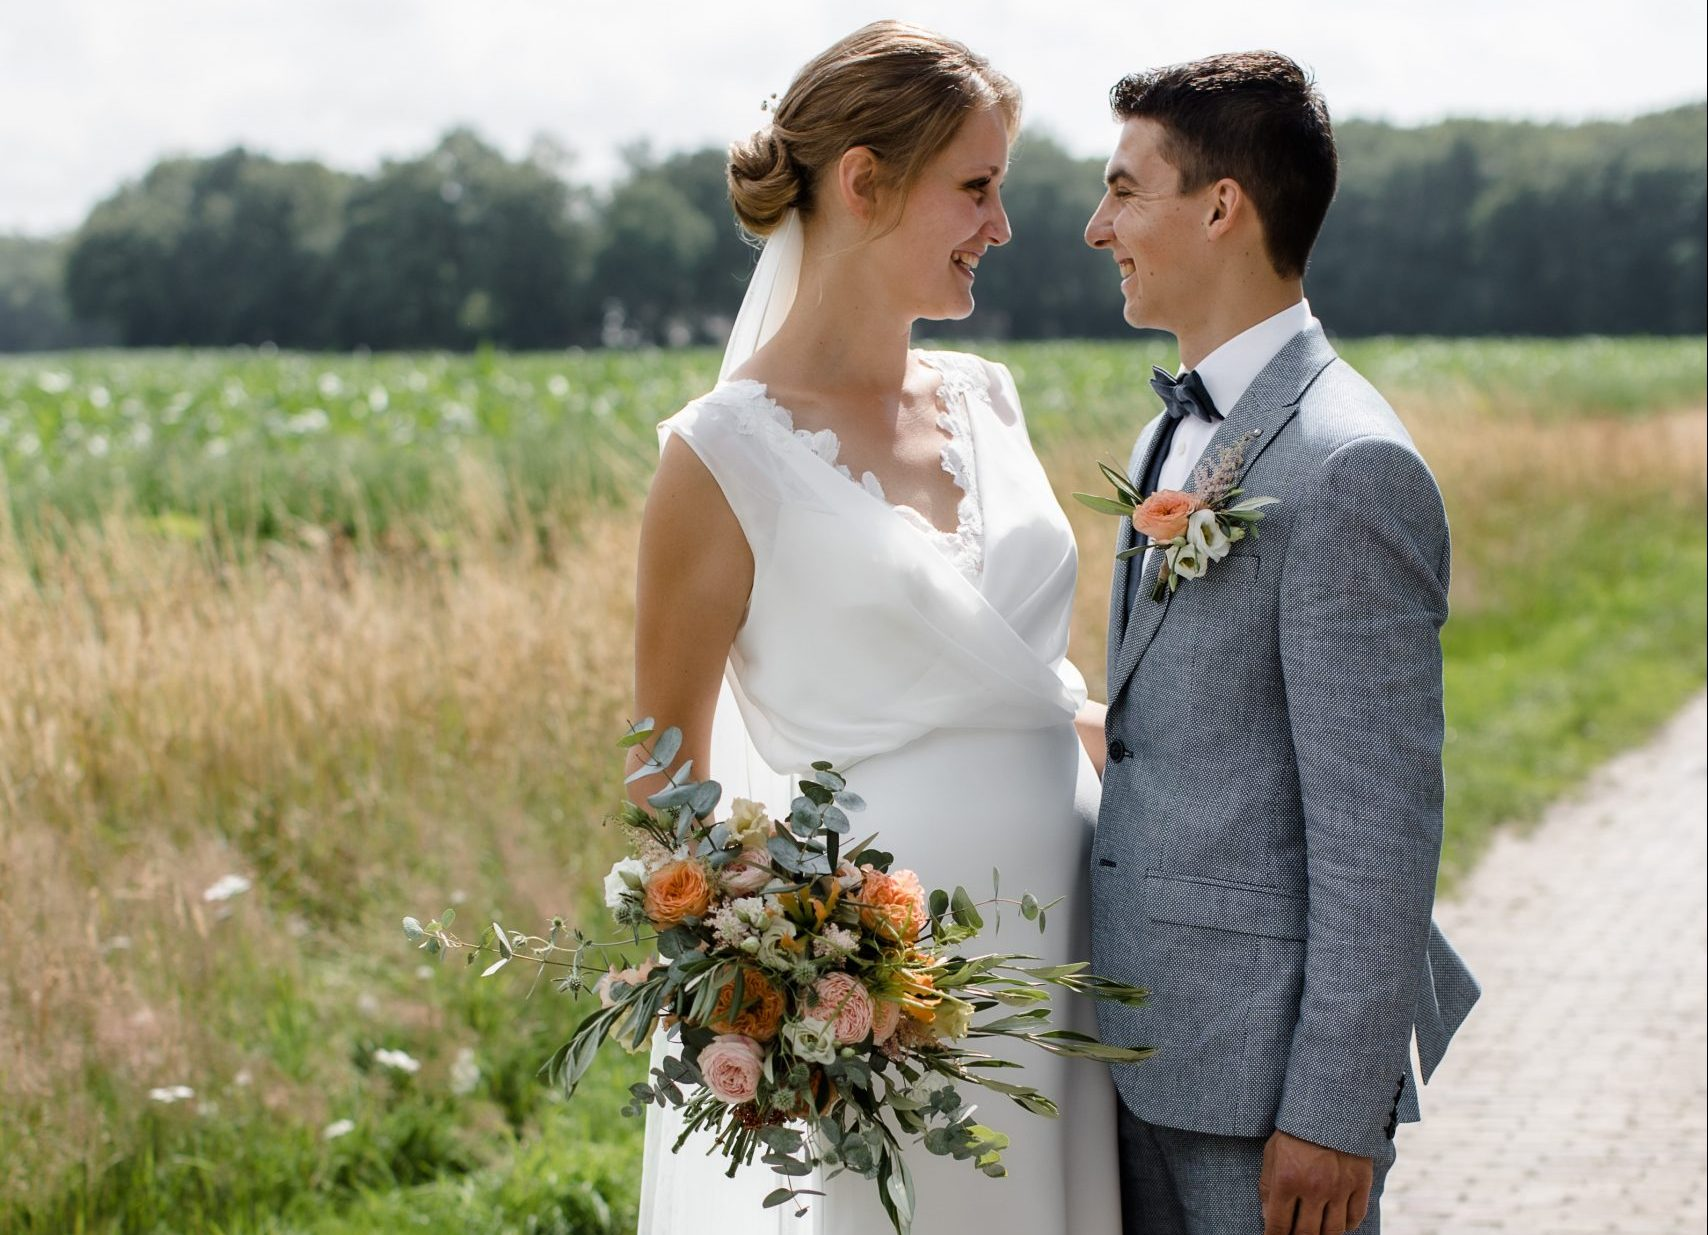 bruidegom-borger-bruidsbloemen-corsage-bruidegomscorsage-veldbloemen-eucalyptus-trouwen-in-drenthe-borger-bloemist